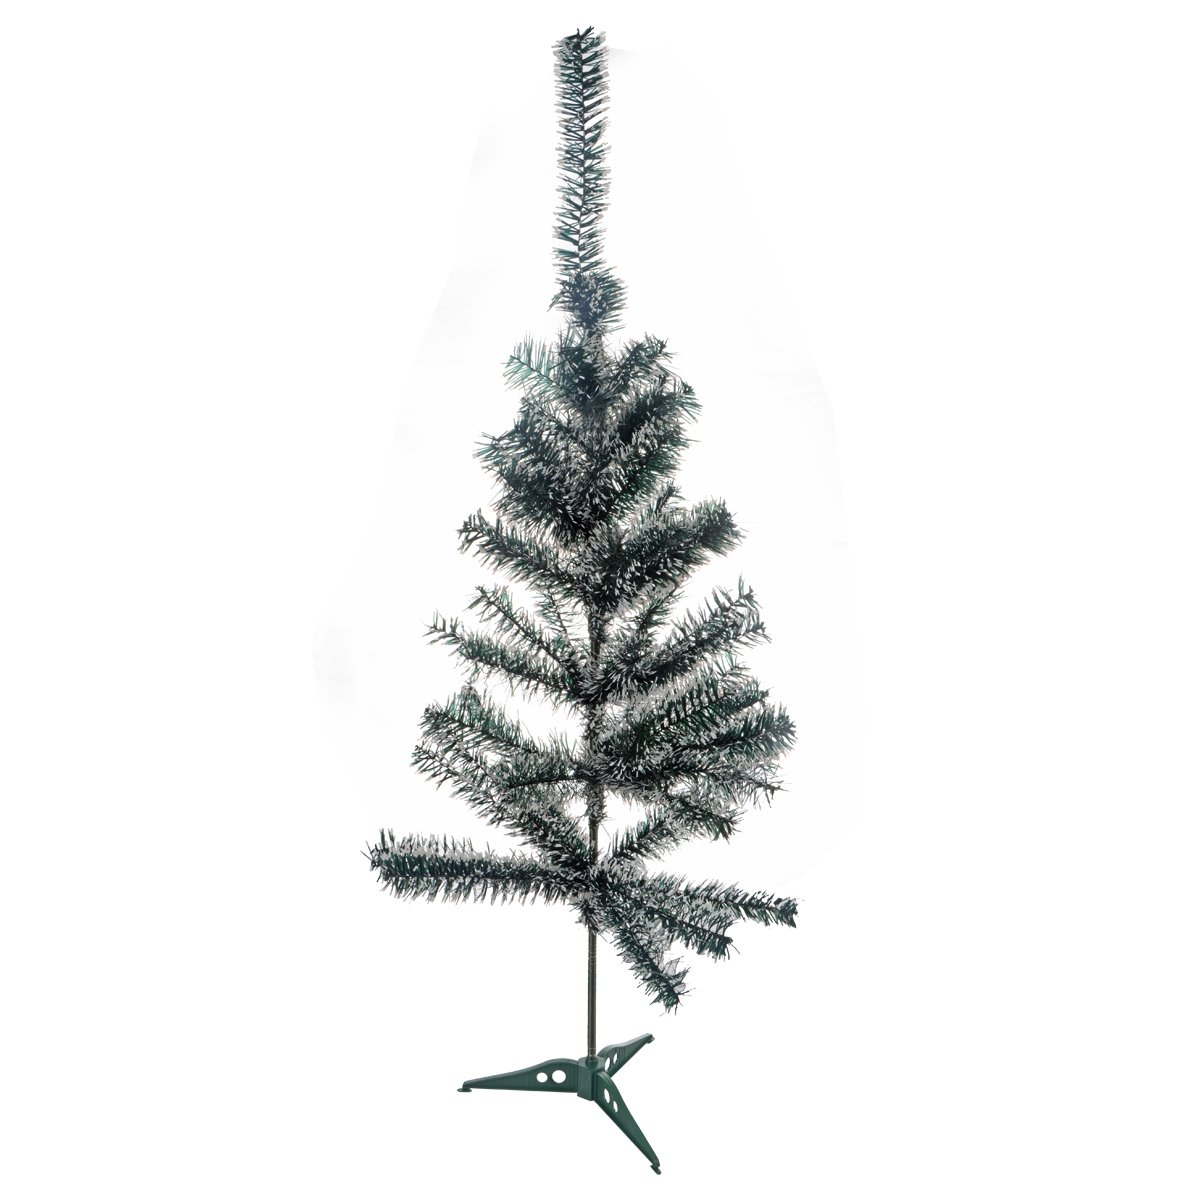 Saim 3Ft Merry Christmas Premium Tabletop Corner Decorated Small Artificial Pine Tree